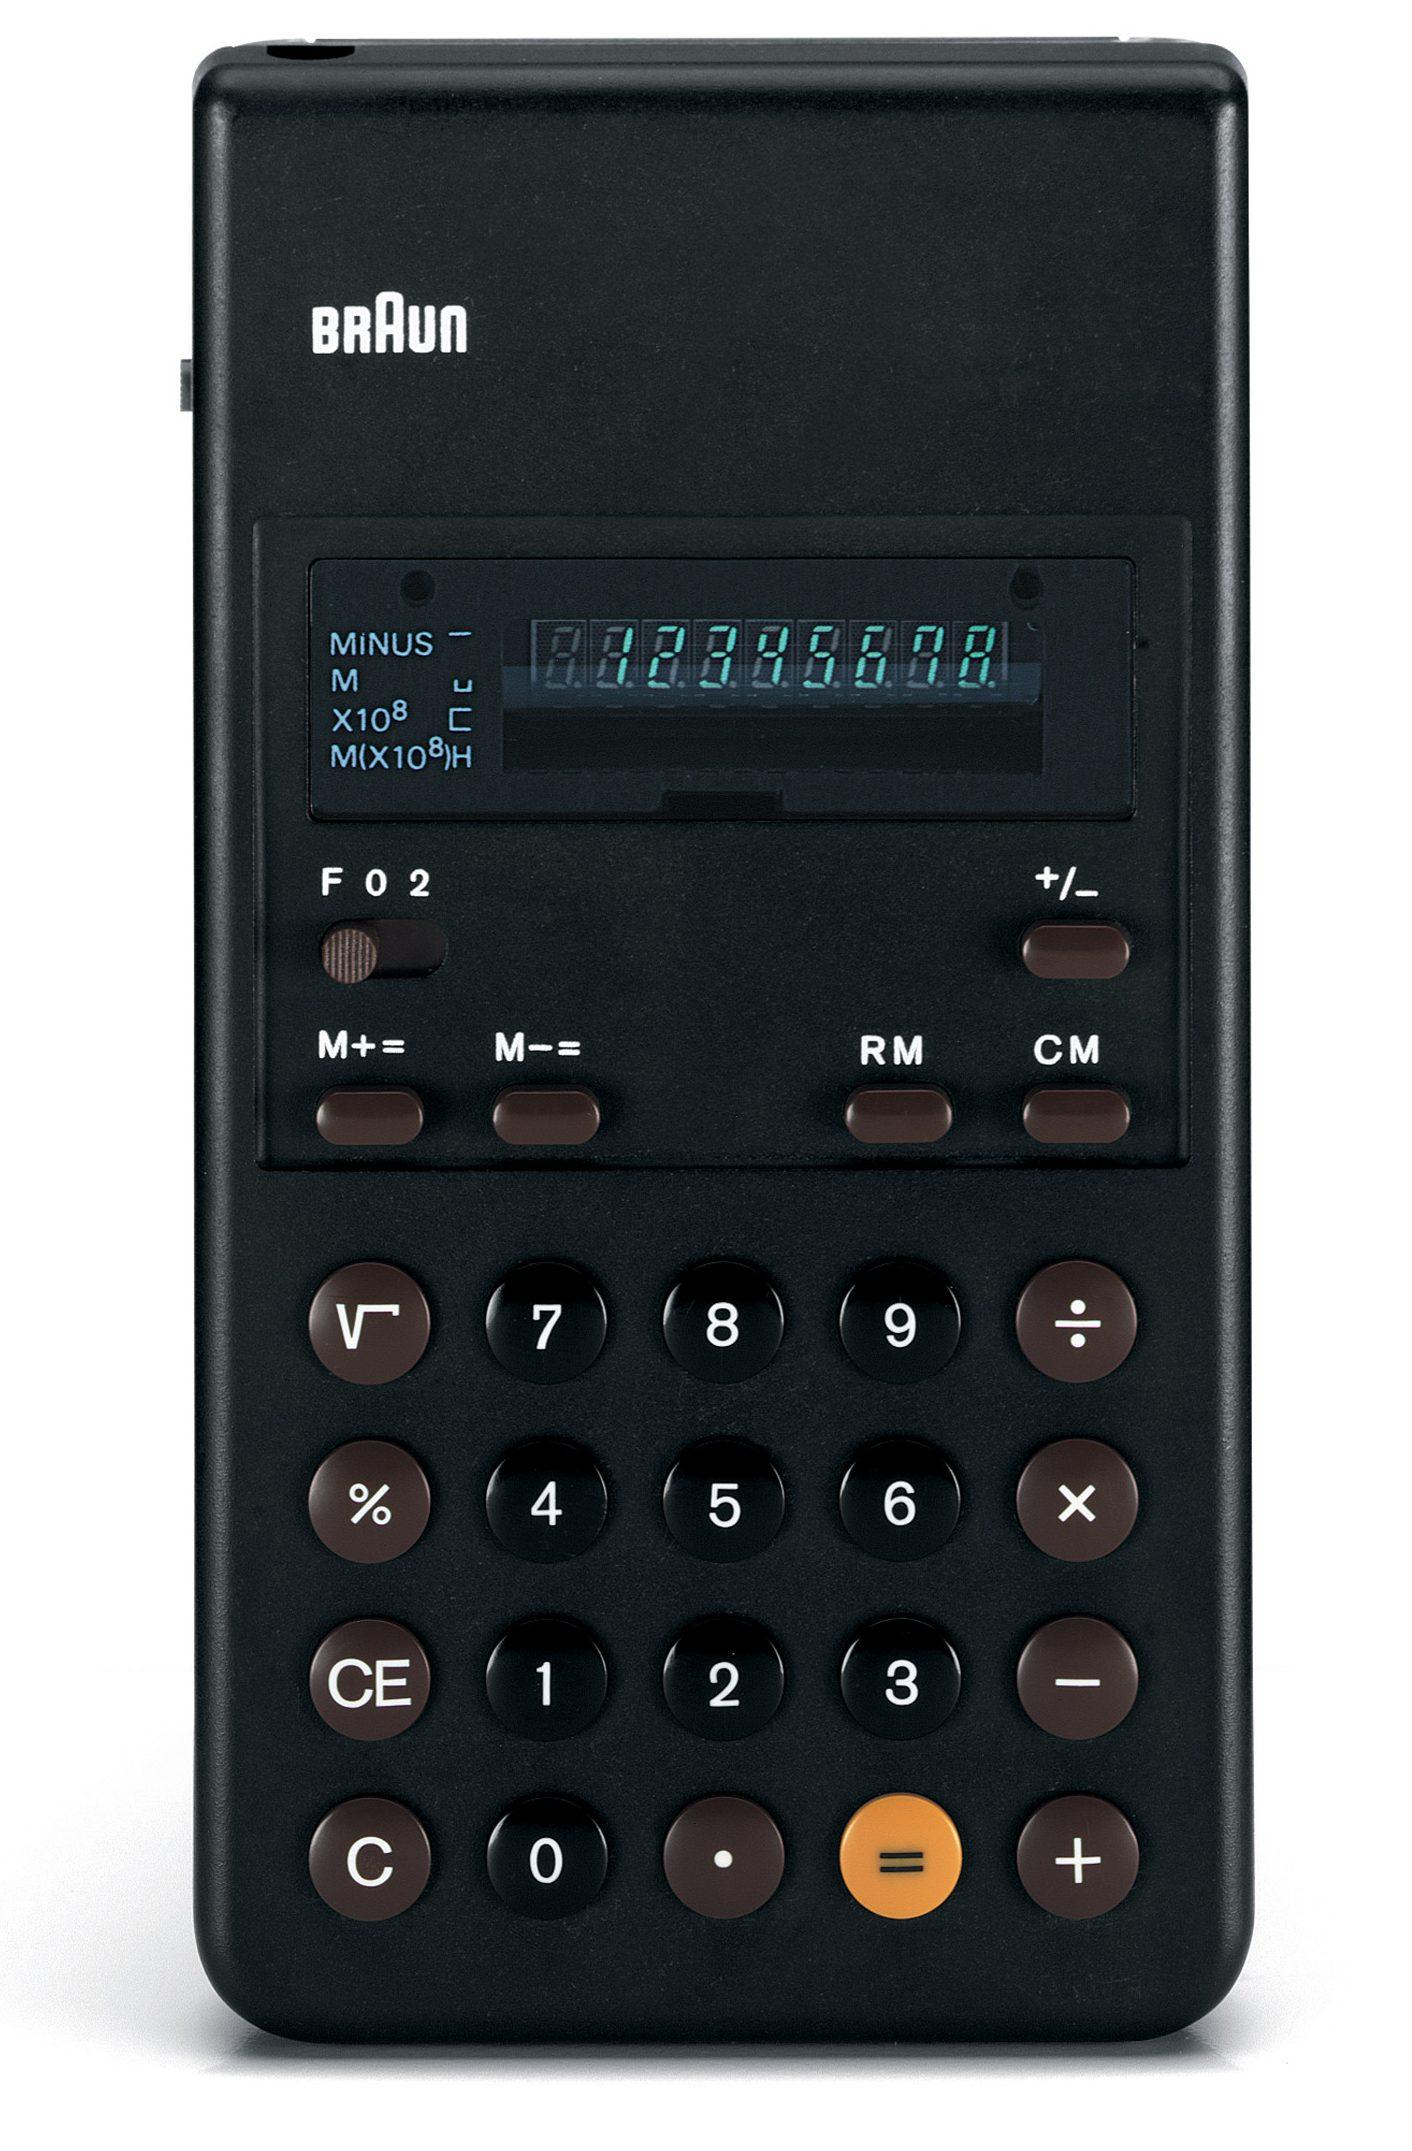 Braun black calculator